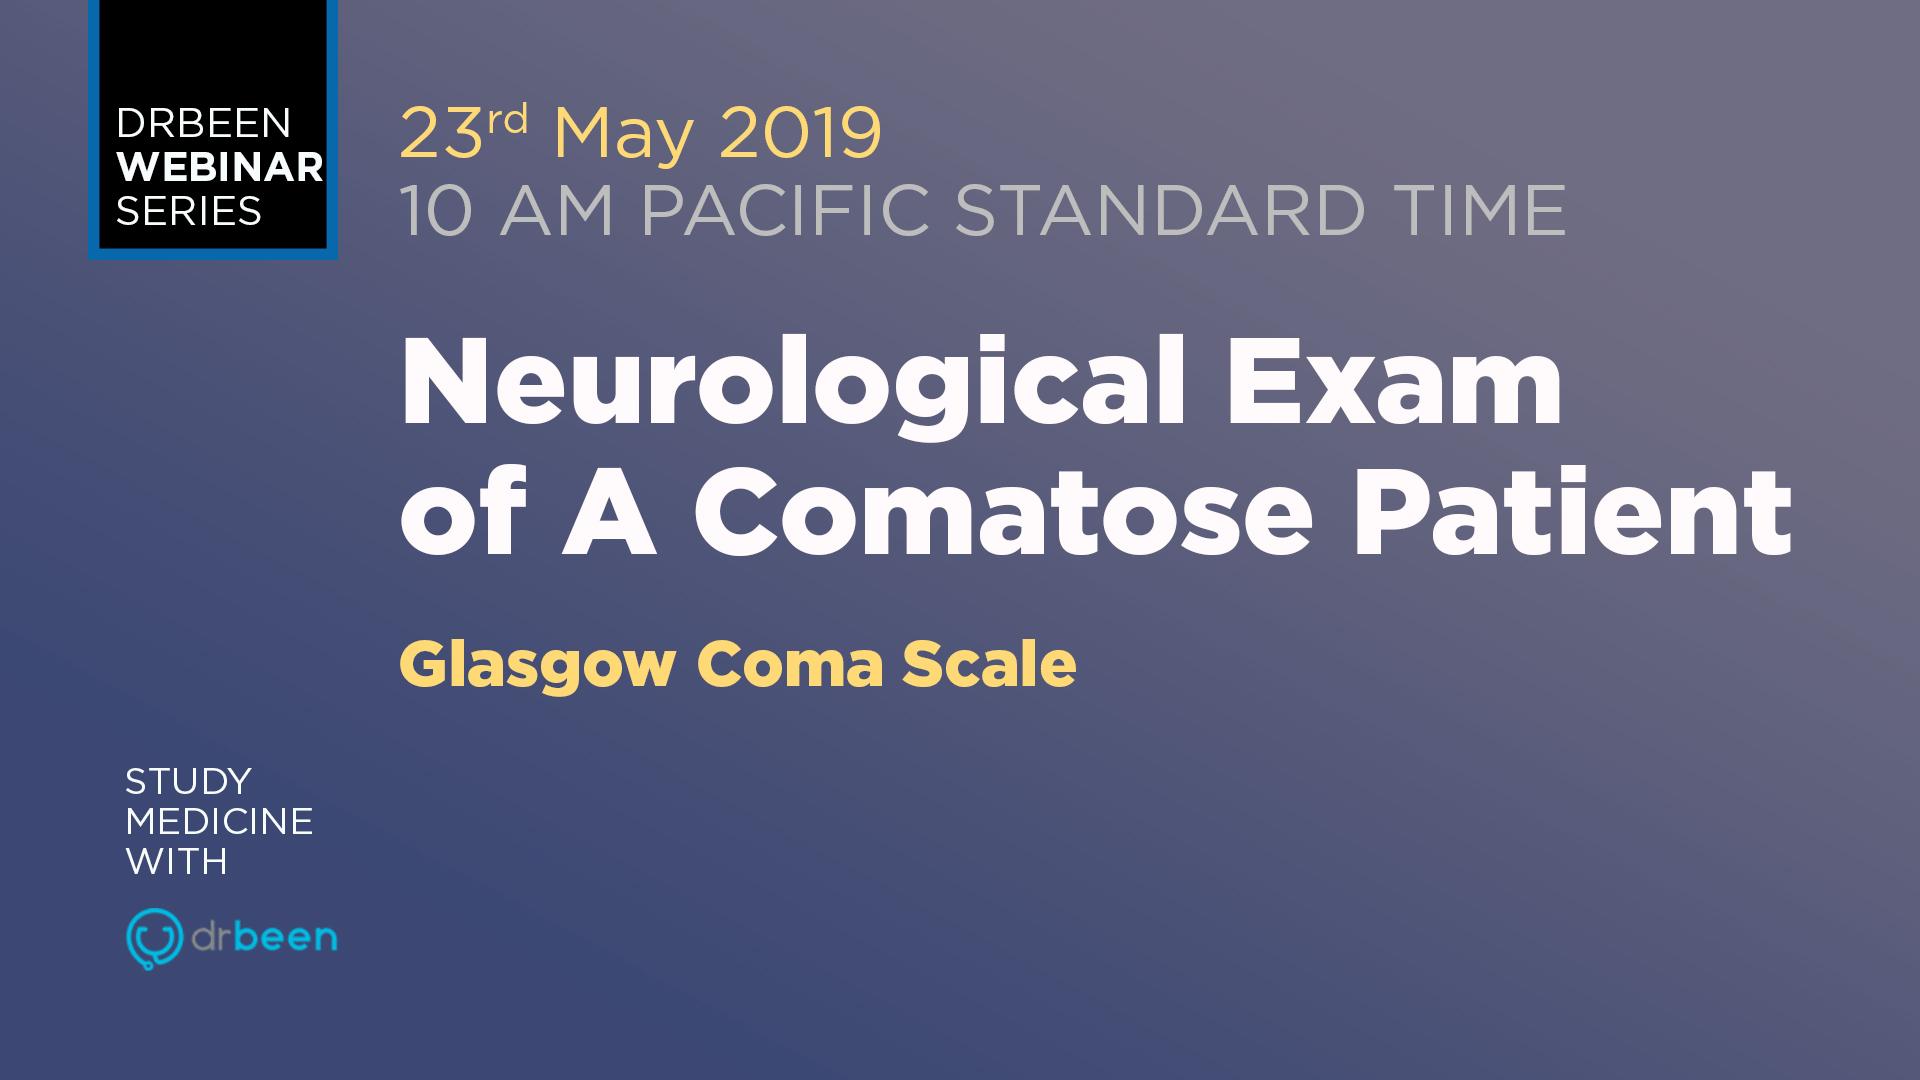 Neurological Exam Of A Comatose Patient Series